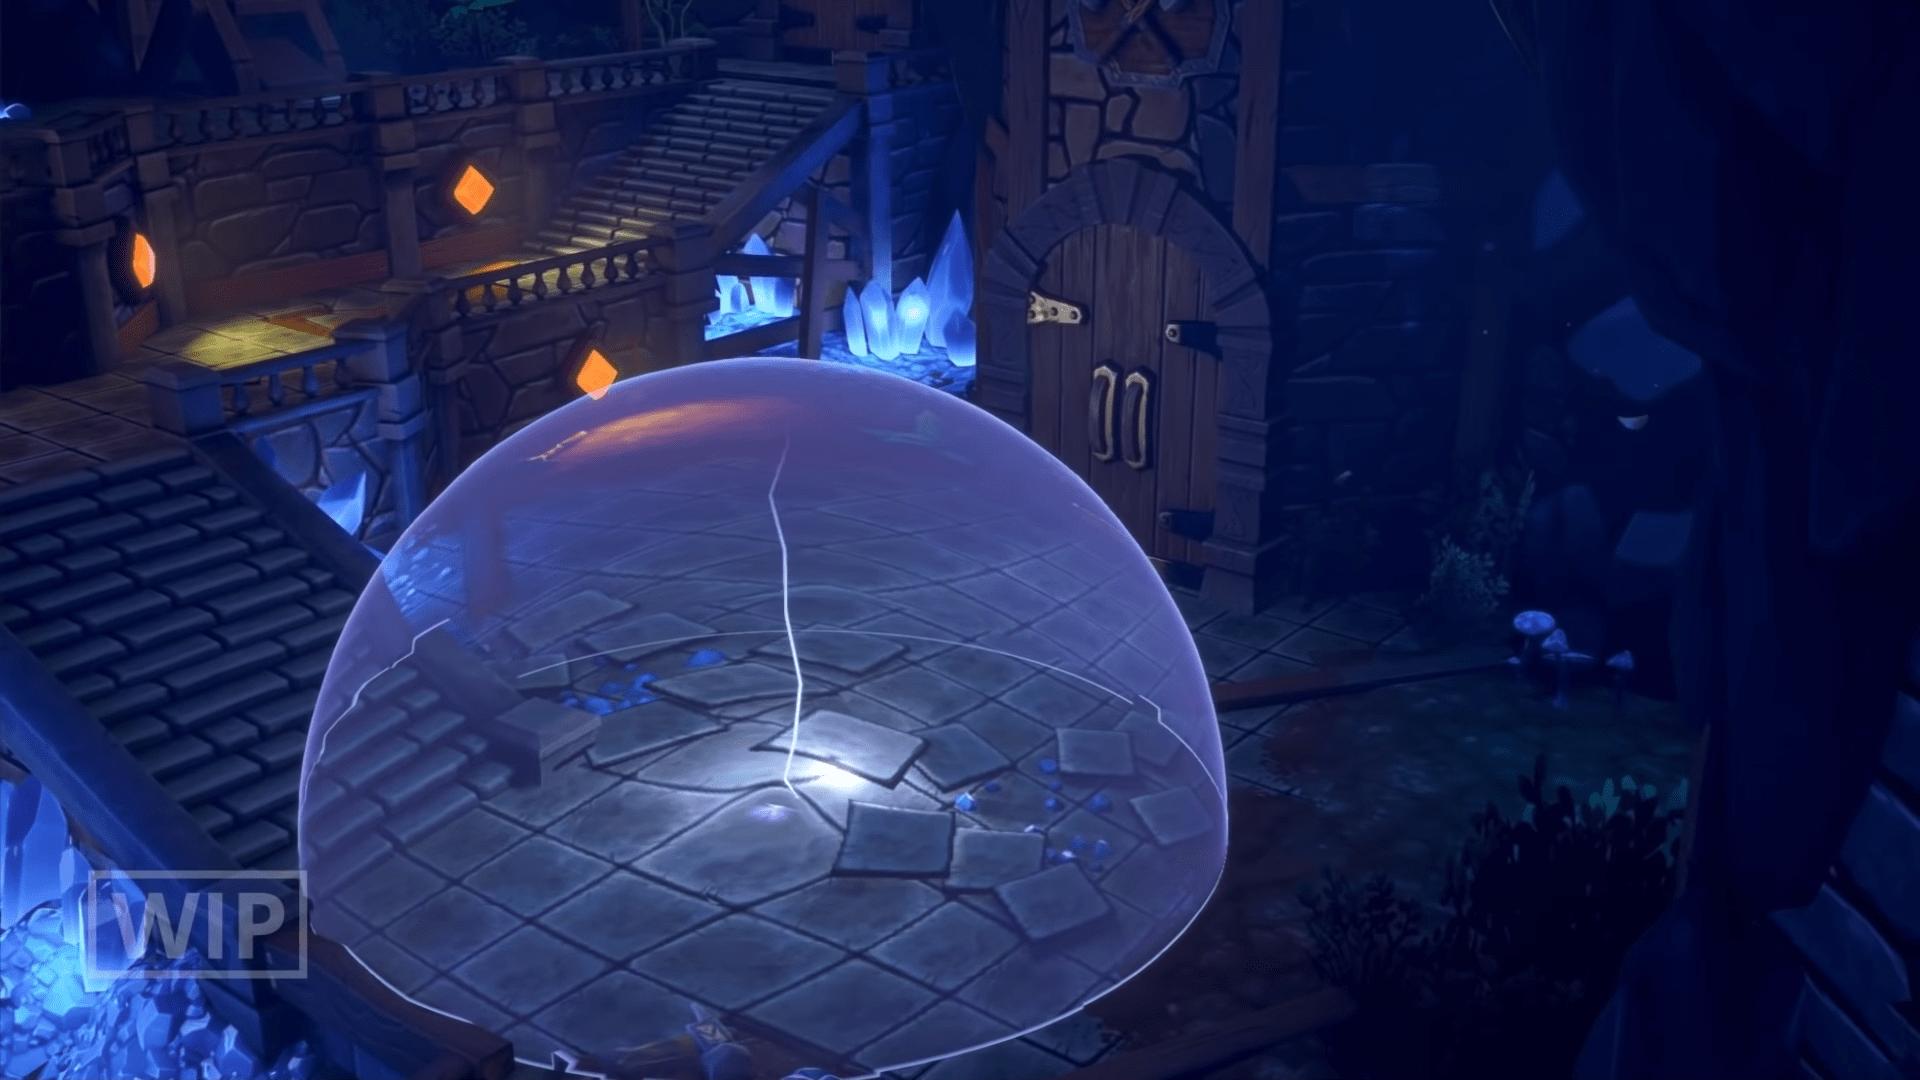 'Dungeon Defenders: Awakened' Begins Closed Beta On Steam Under New Developer Name